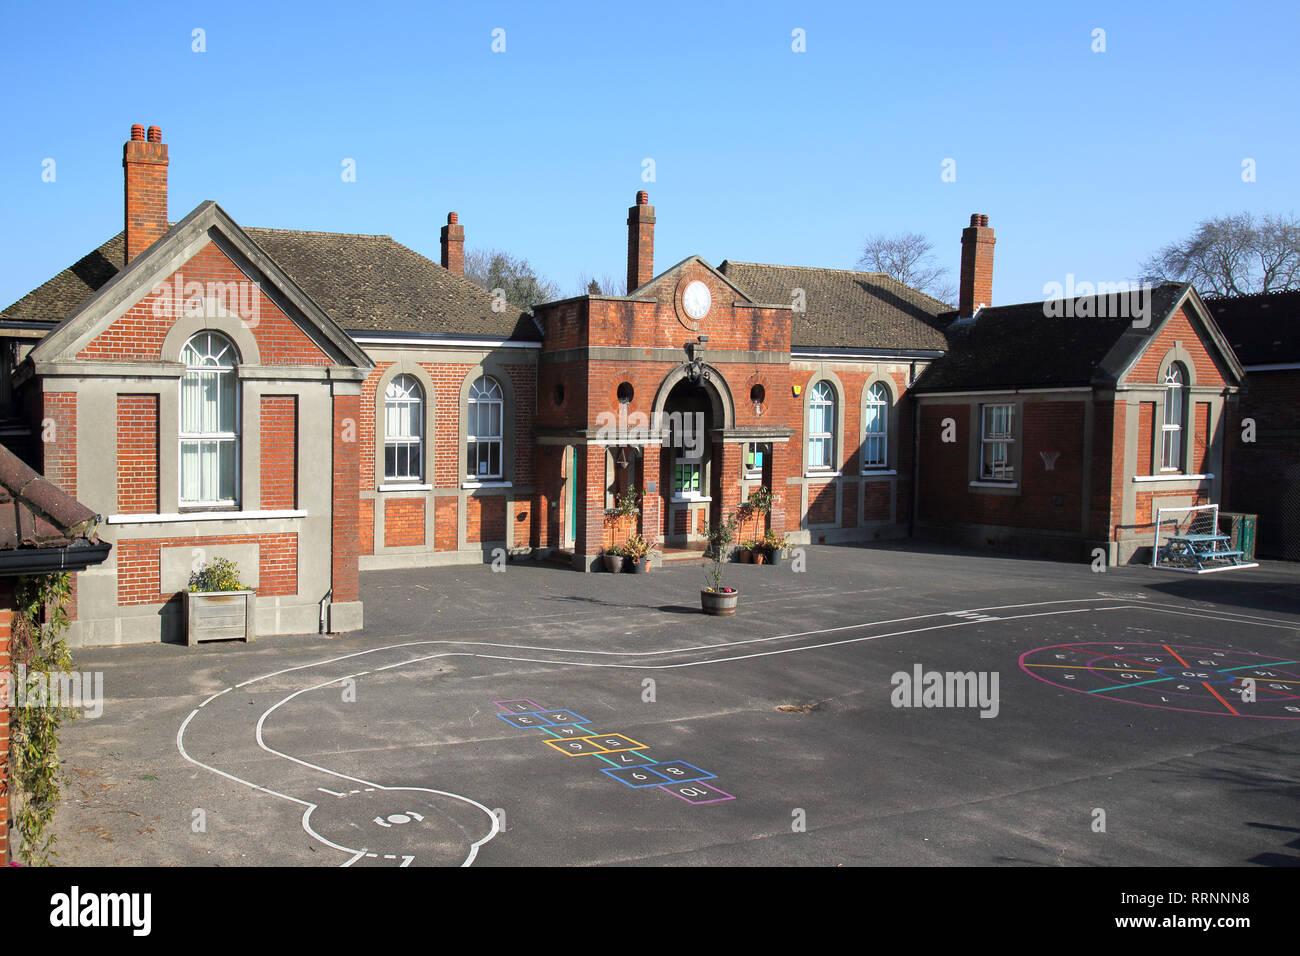 the infants school in hassocks west sussex - Stock Image